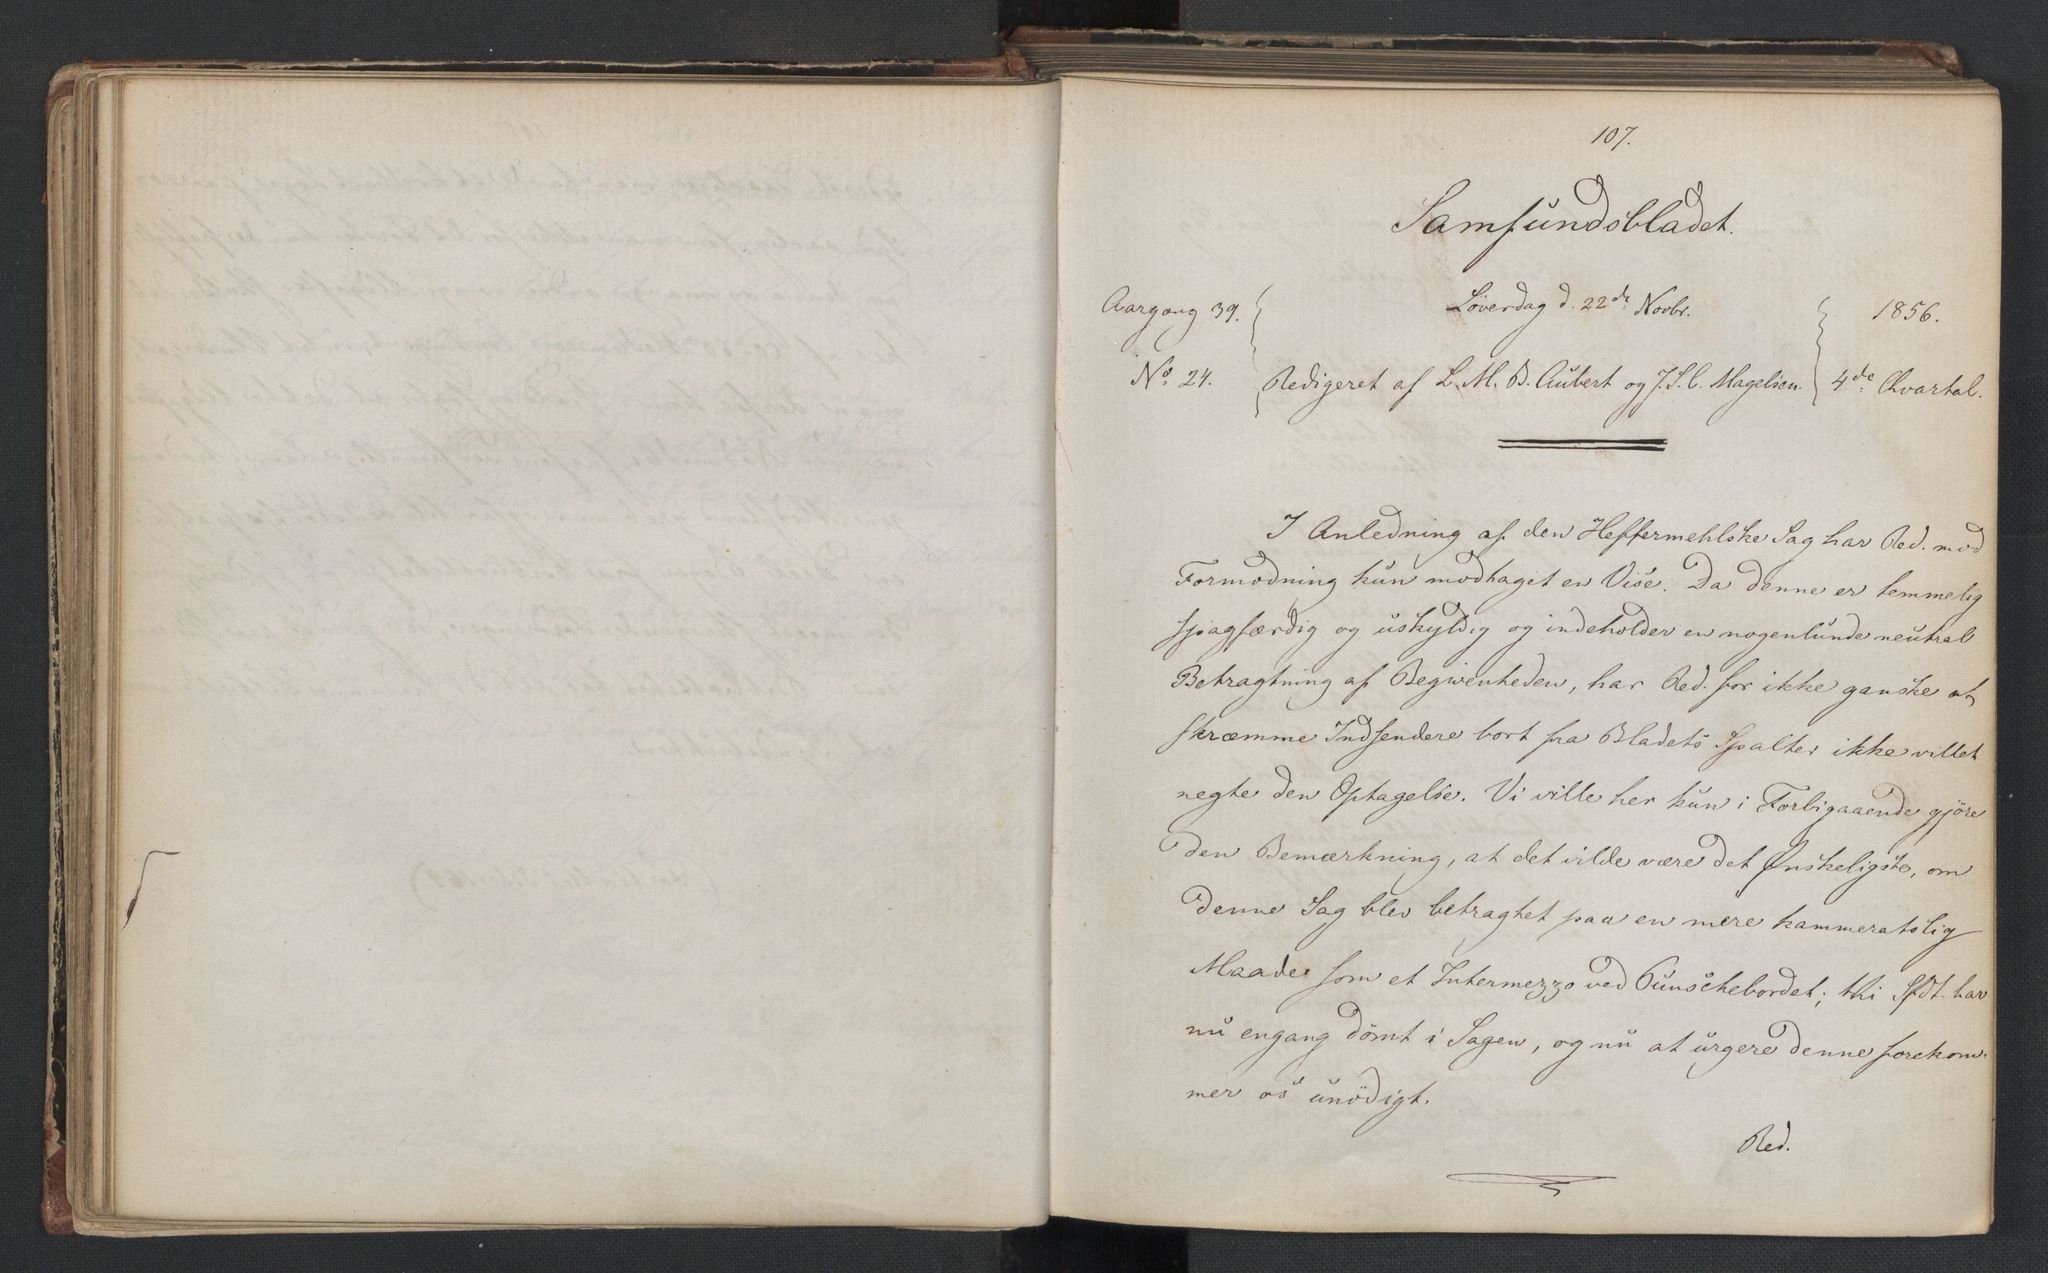 RA, Det Norske Studentersamfund, X/Xa/L0006, 1856-1857, s. 57